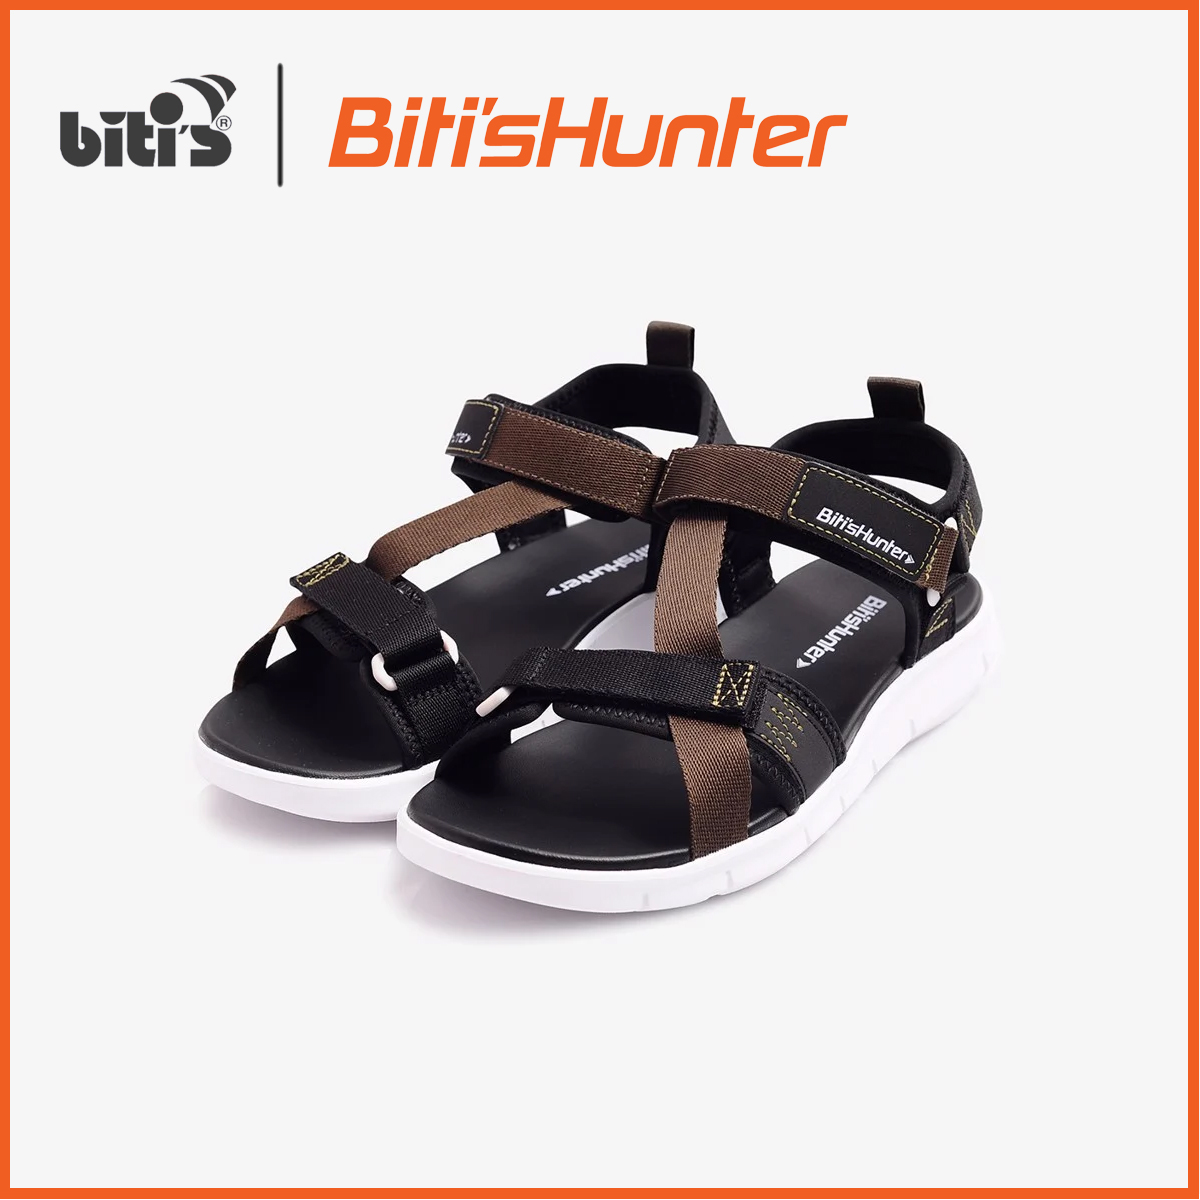 Sandal Nữ Biti's Hunter DEWH00500DEN (Đen)